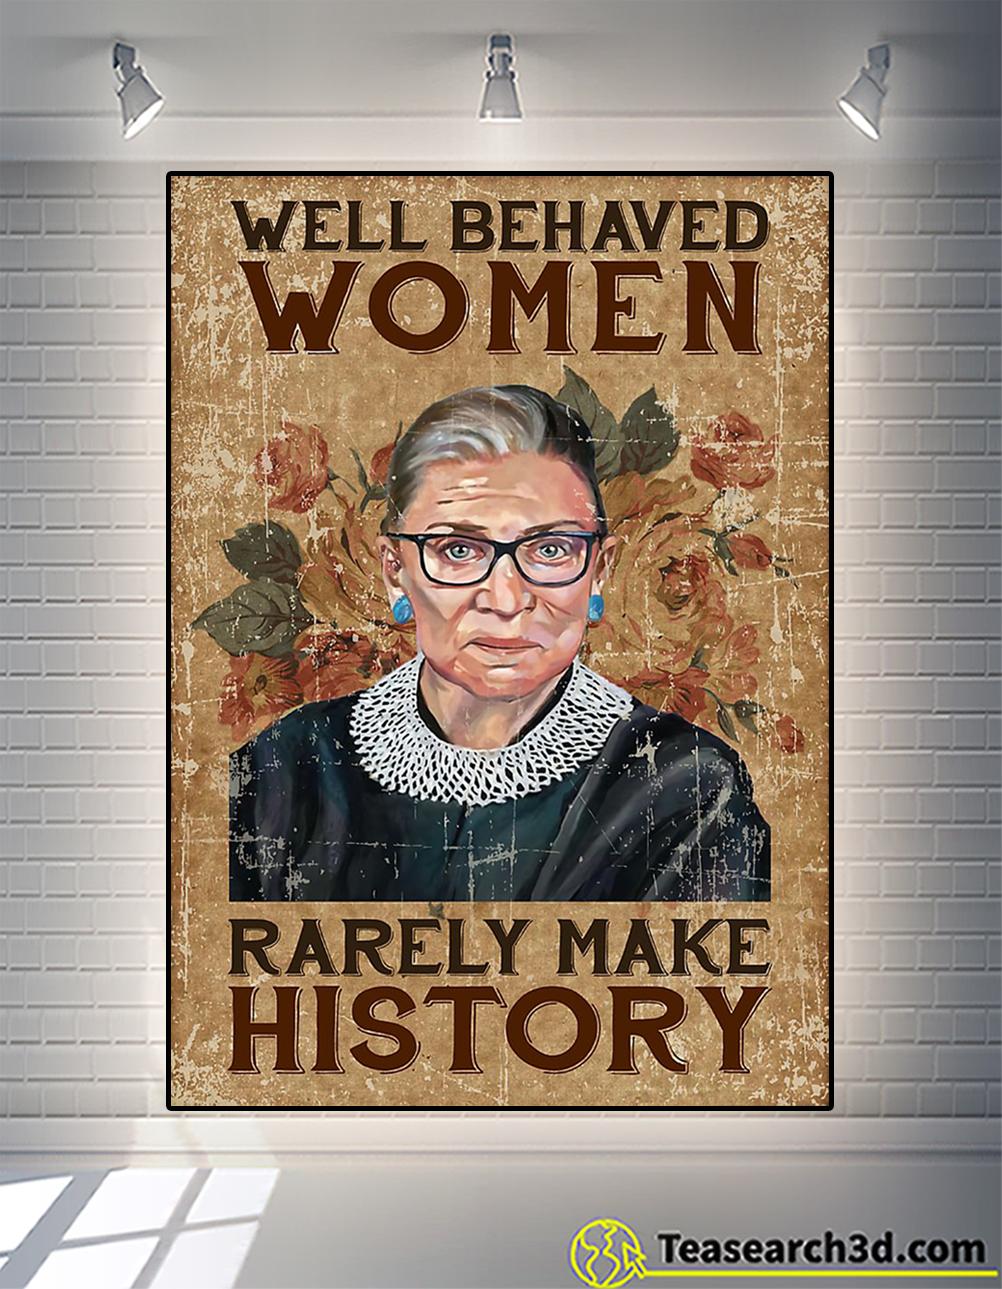 Ruth bader ginsburg well behaved woman rarely make history poster